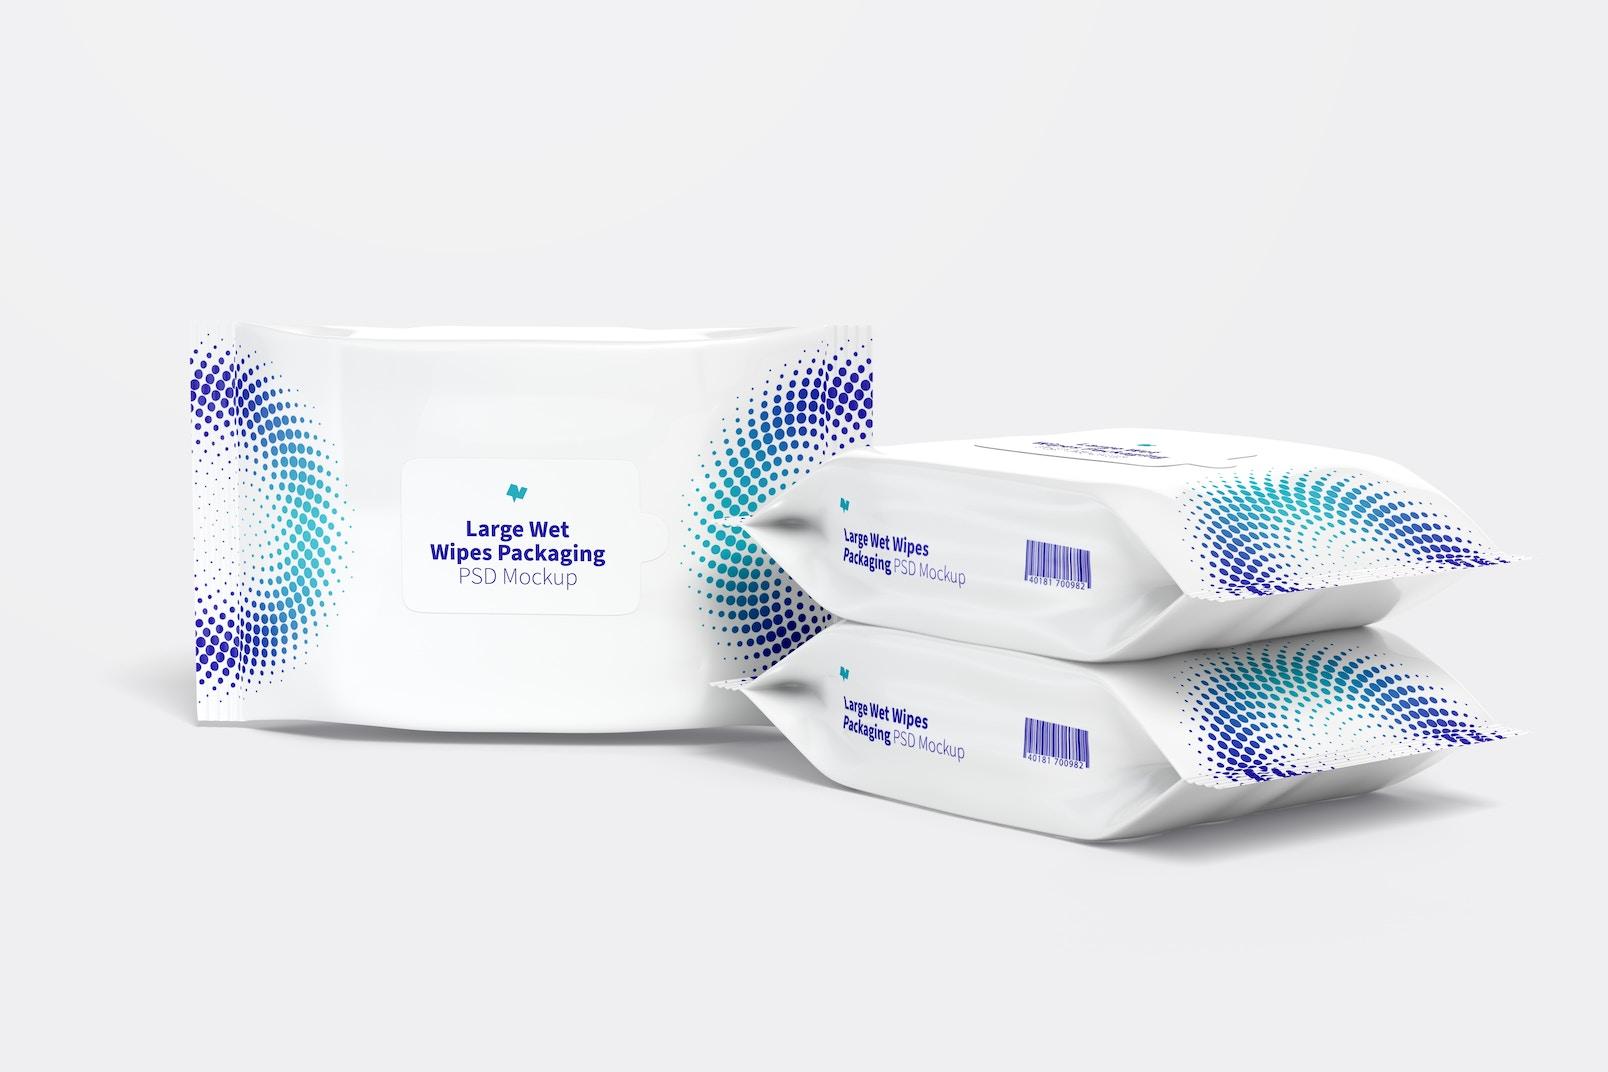 Large Wet Wipes Packaging Set Mockup